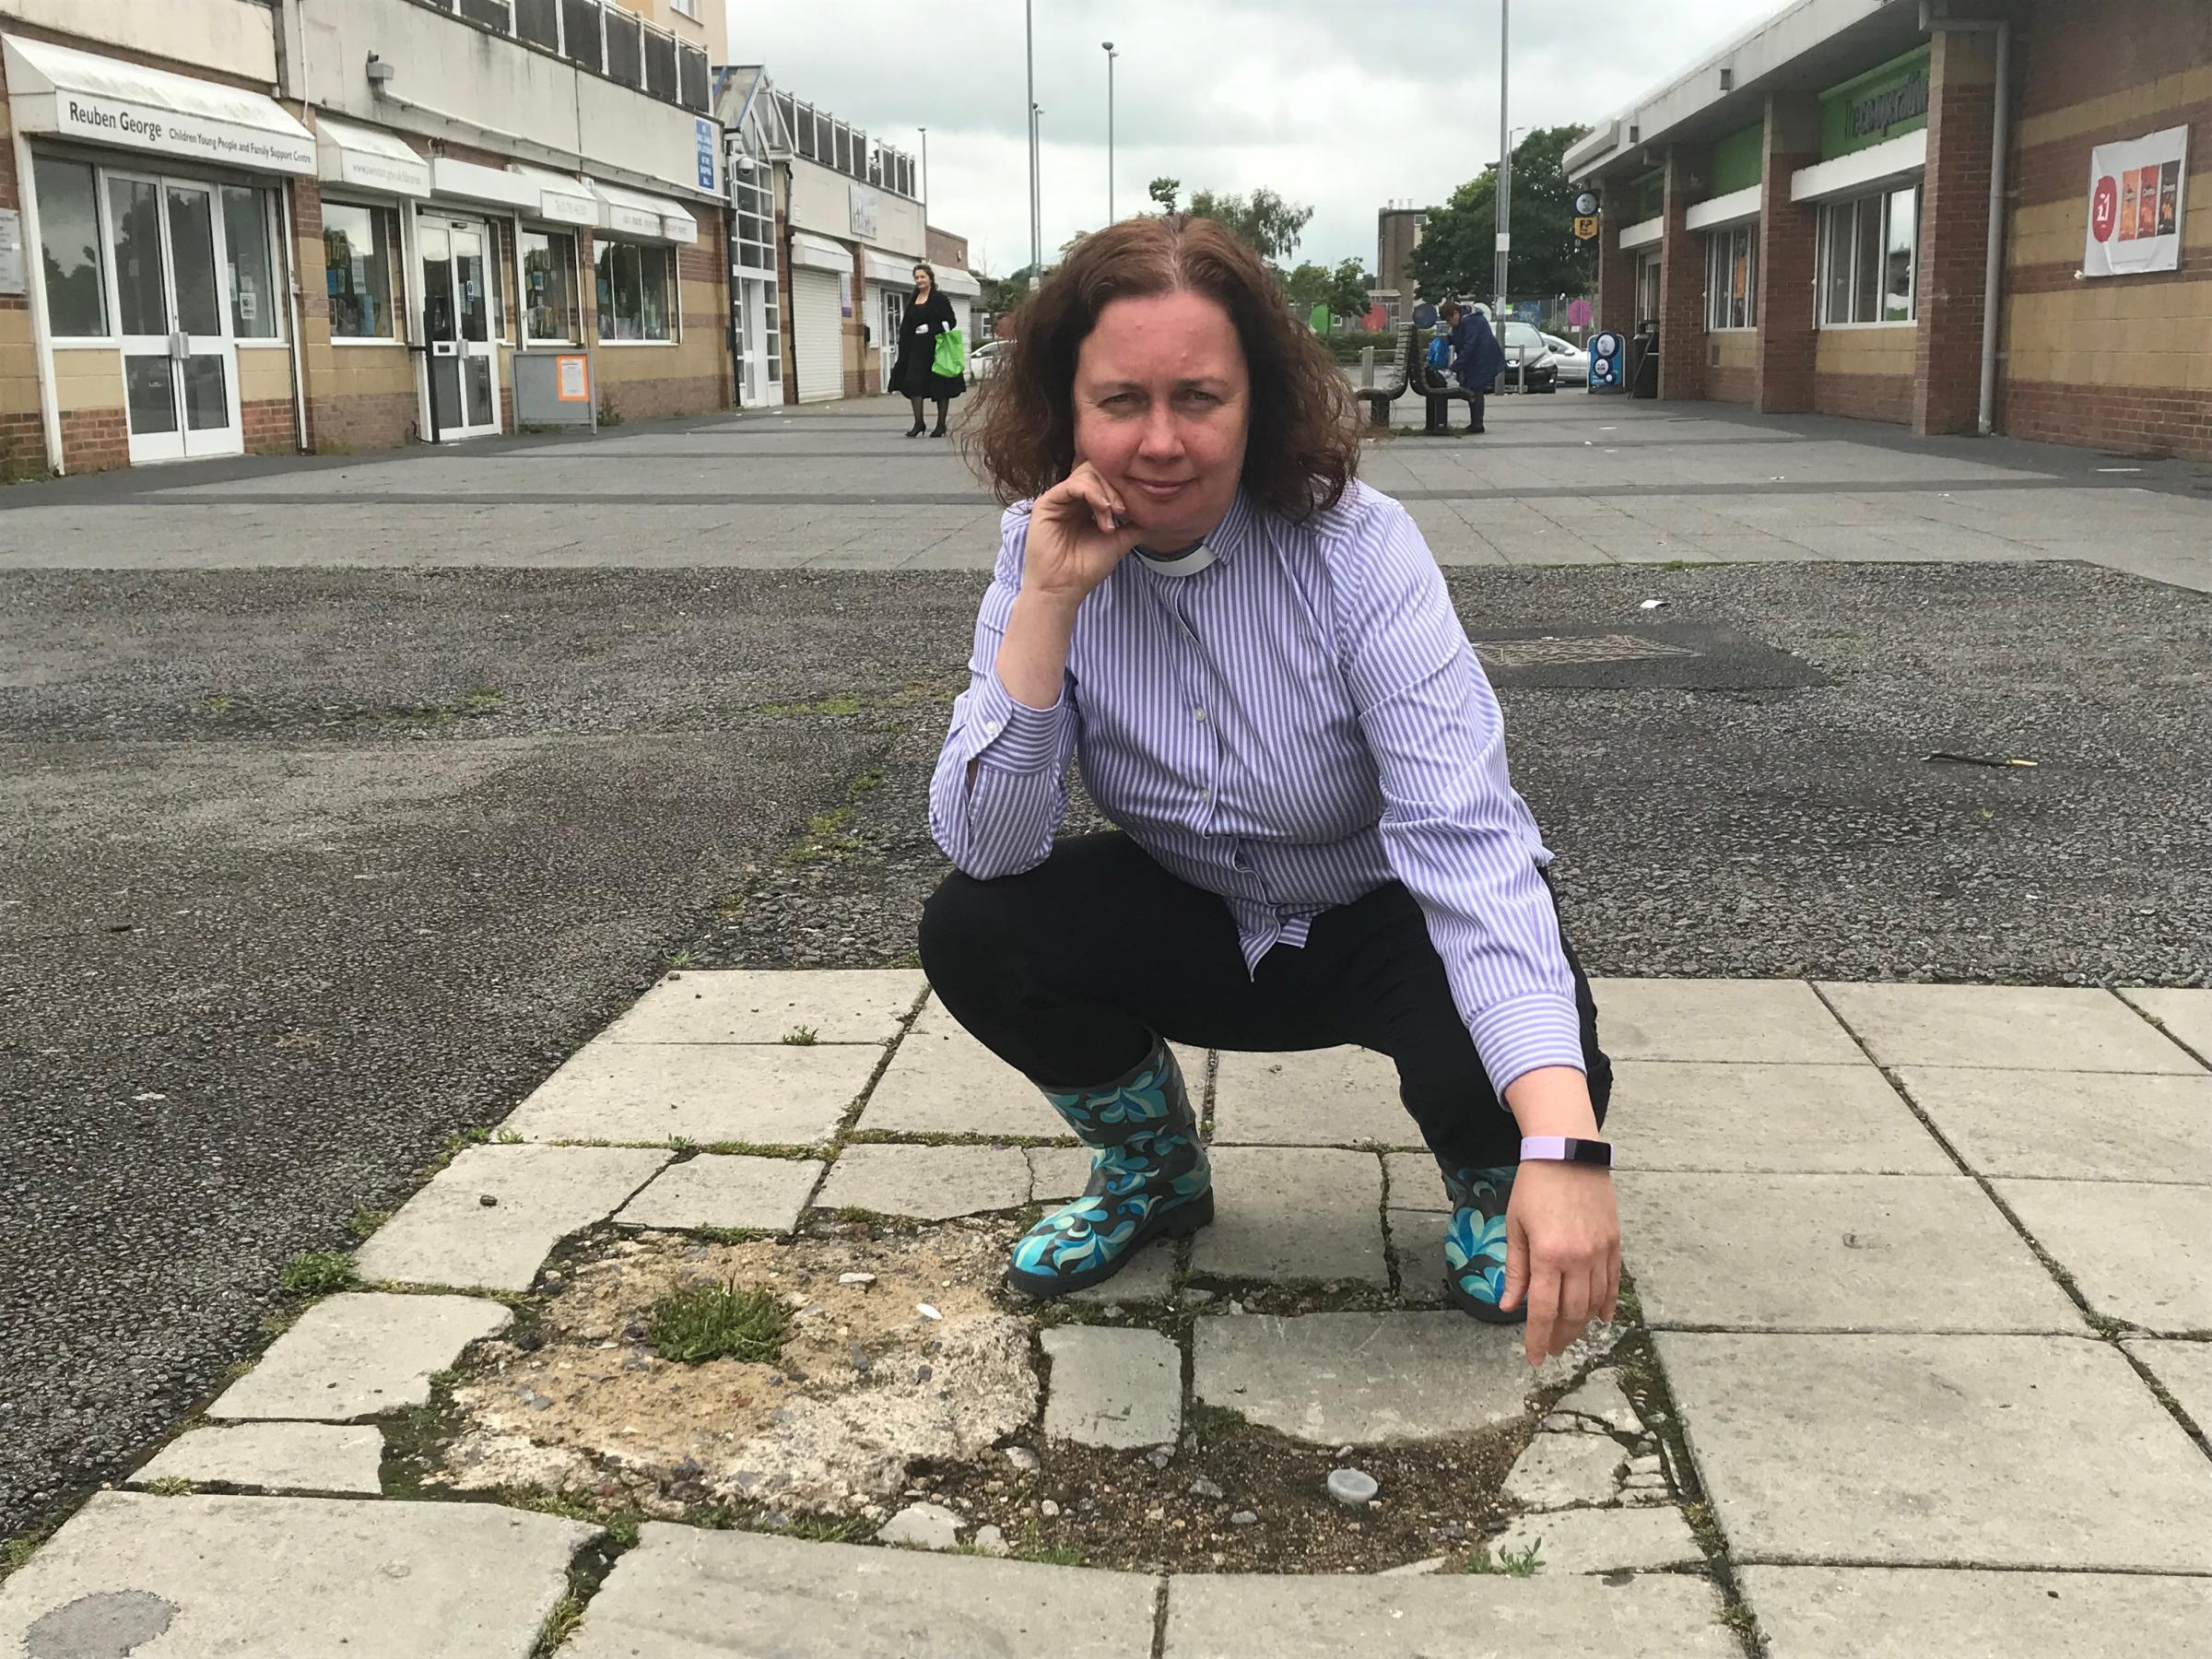 Lawn vicar calls on council to fix up Cavendish Square